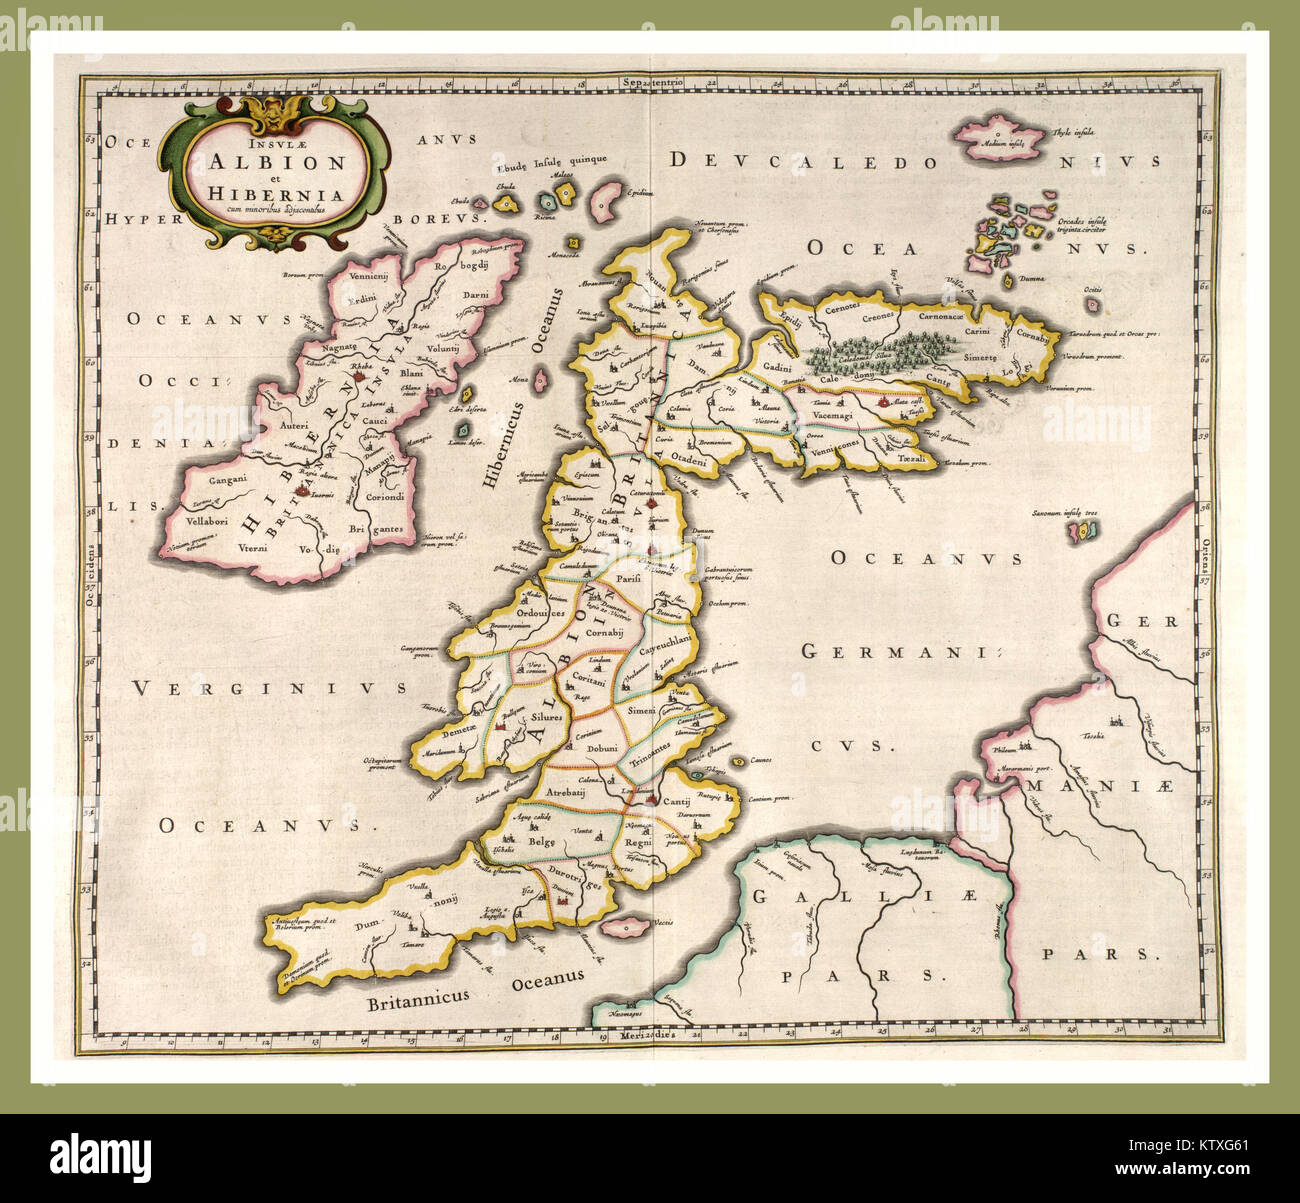 scotland in latin